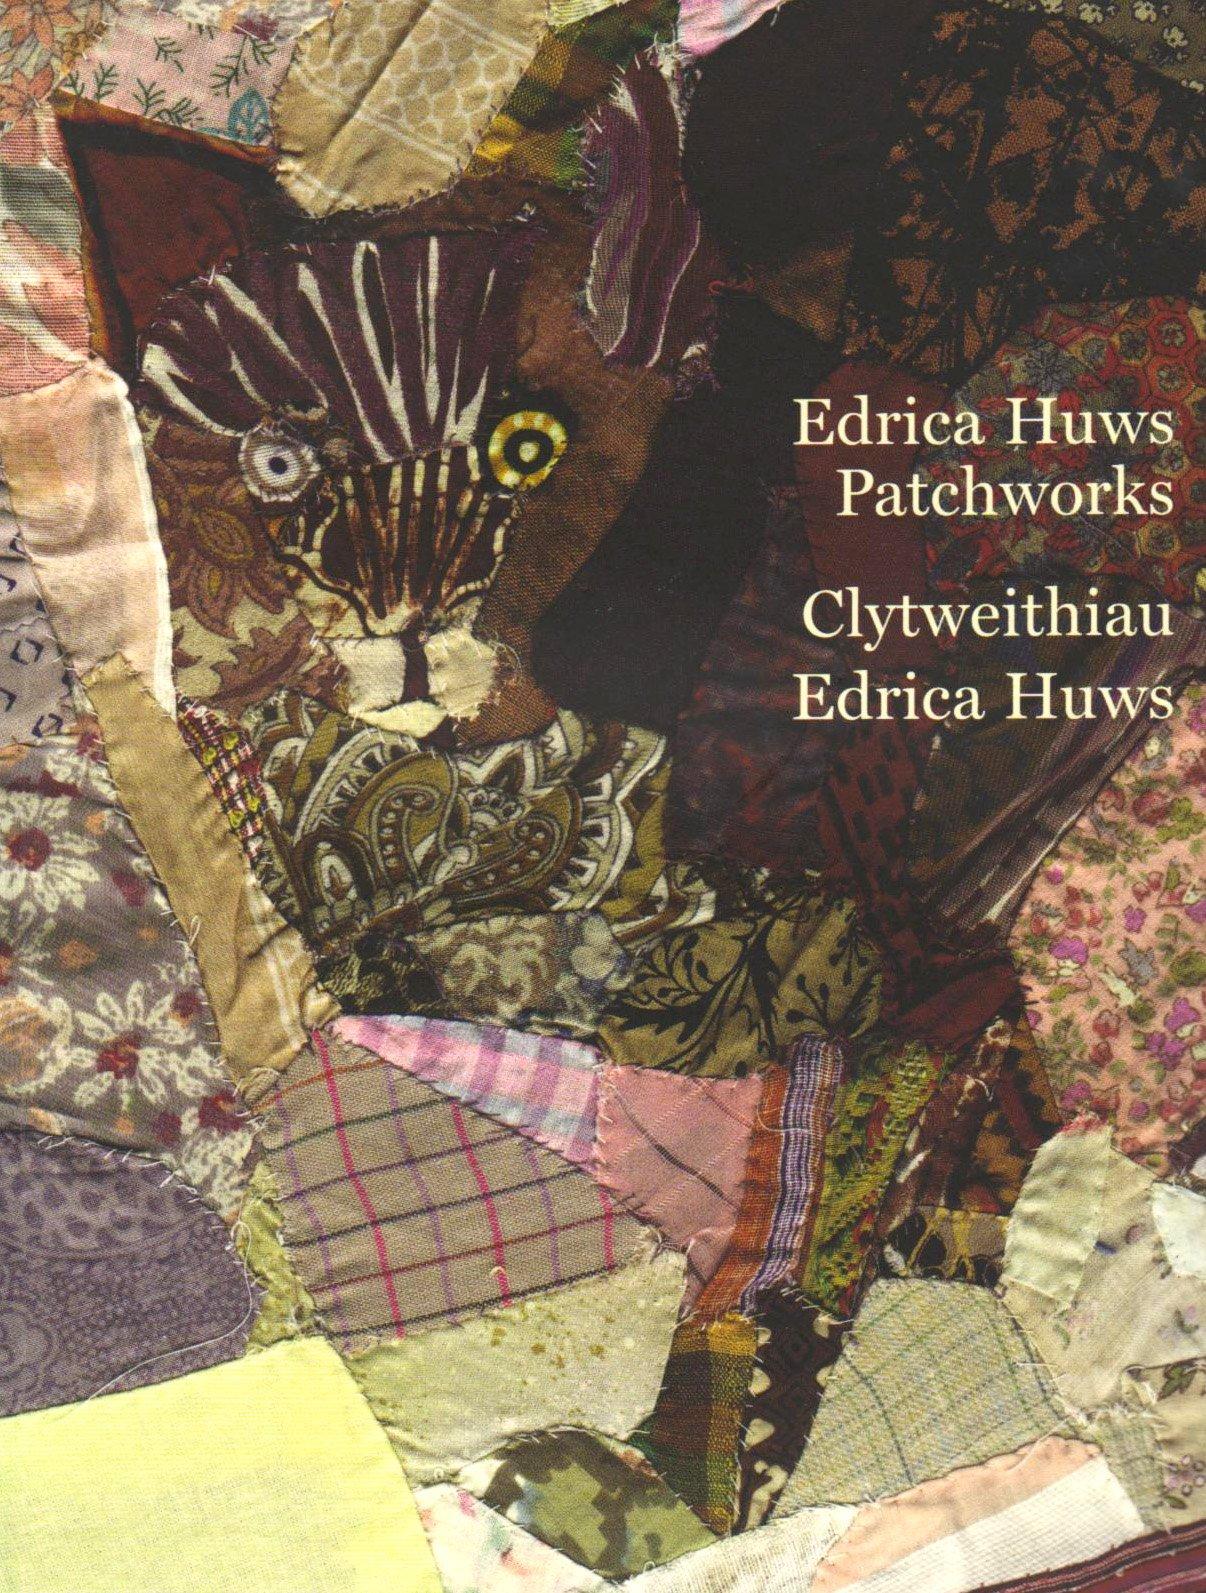 Edrica Huws Patchworks/Clytweithiau Edrica Huws